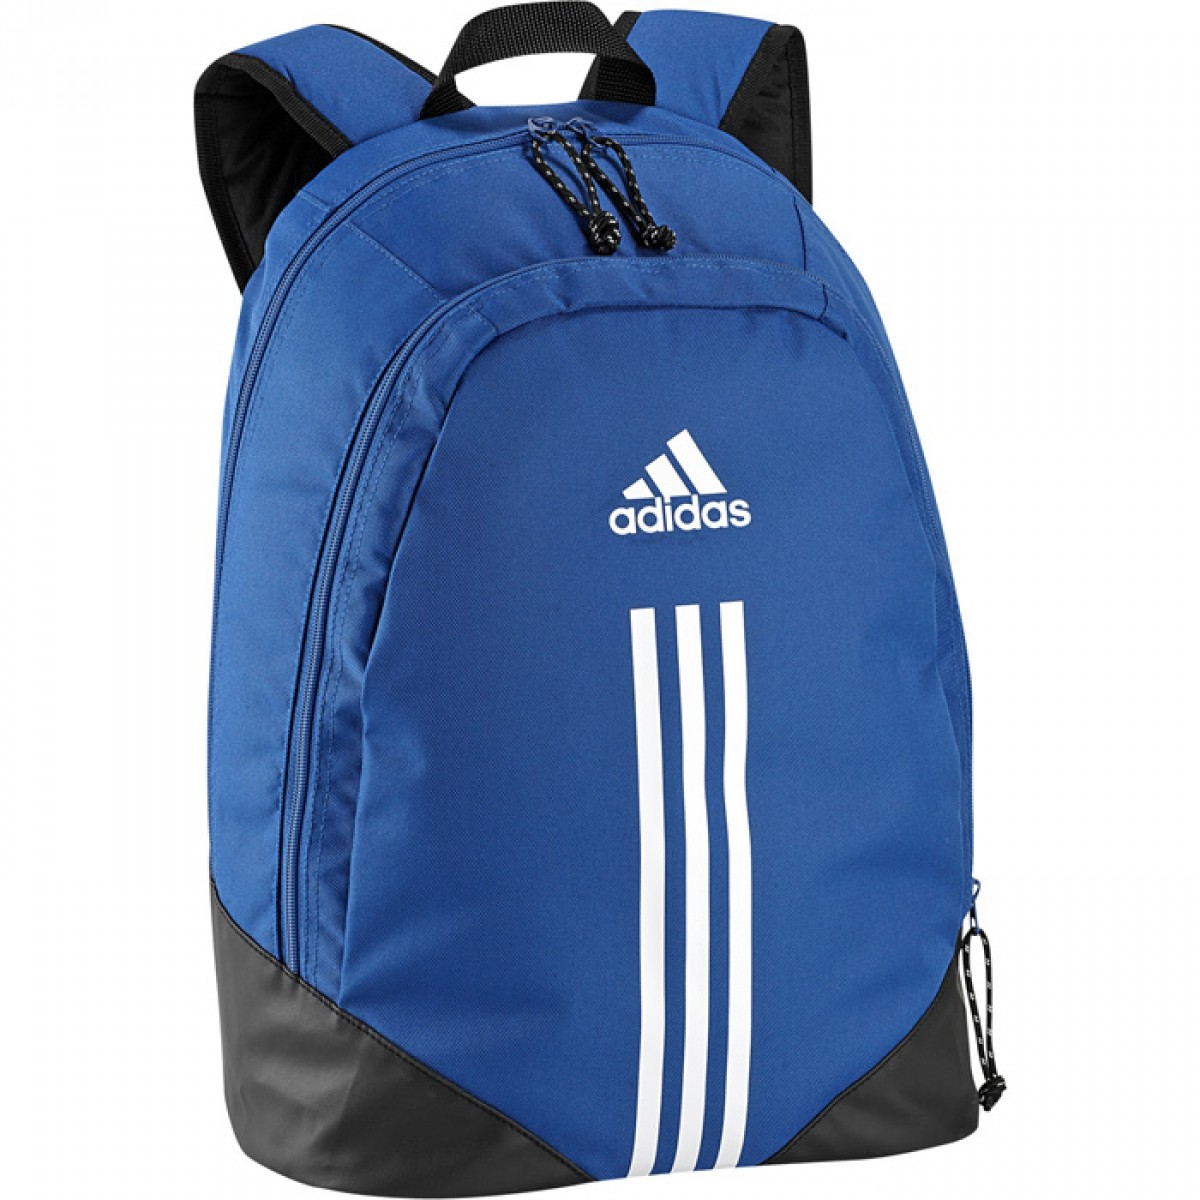 Okul Hediyen Adidas'tan 49